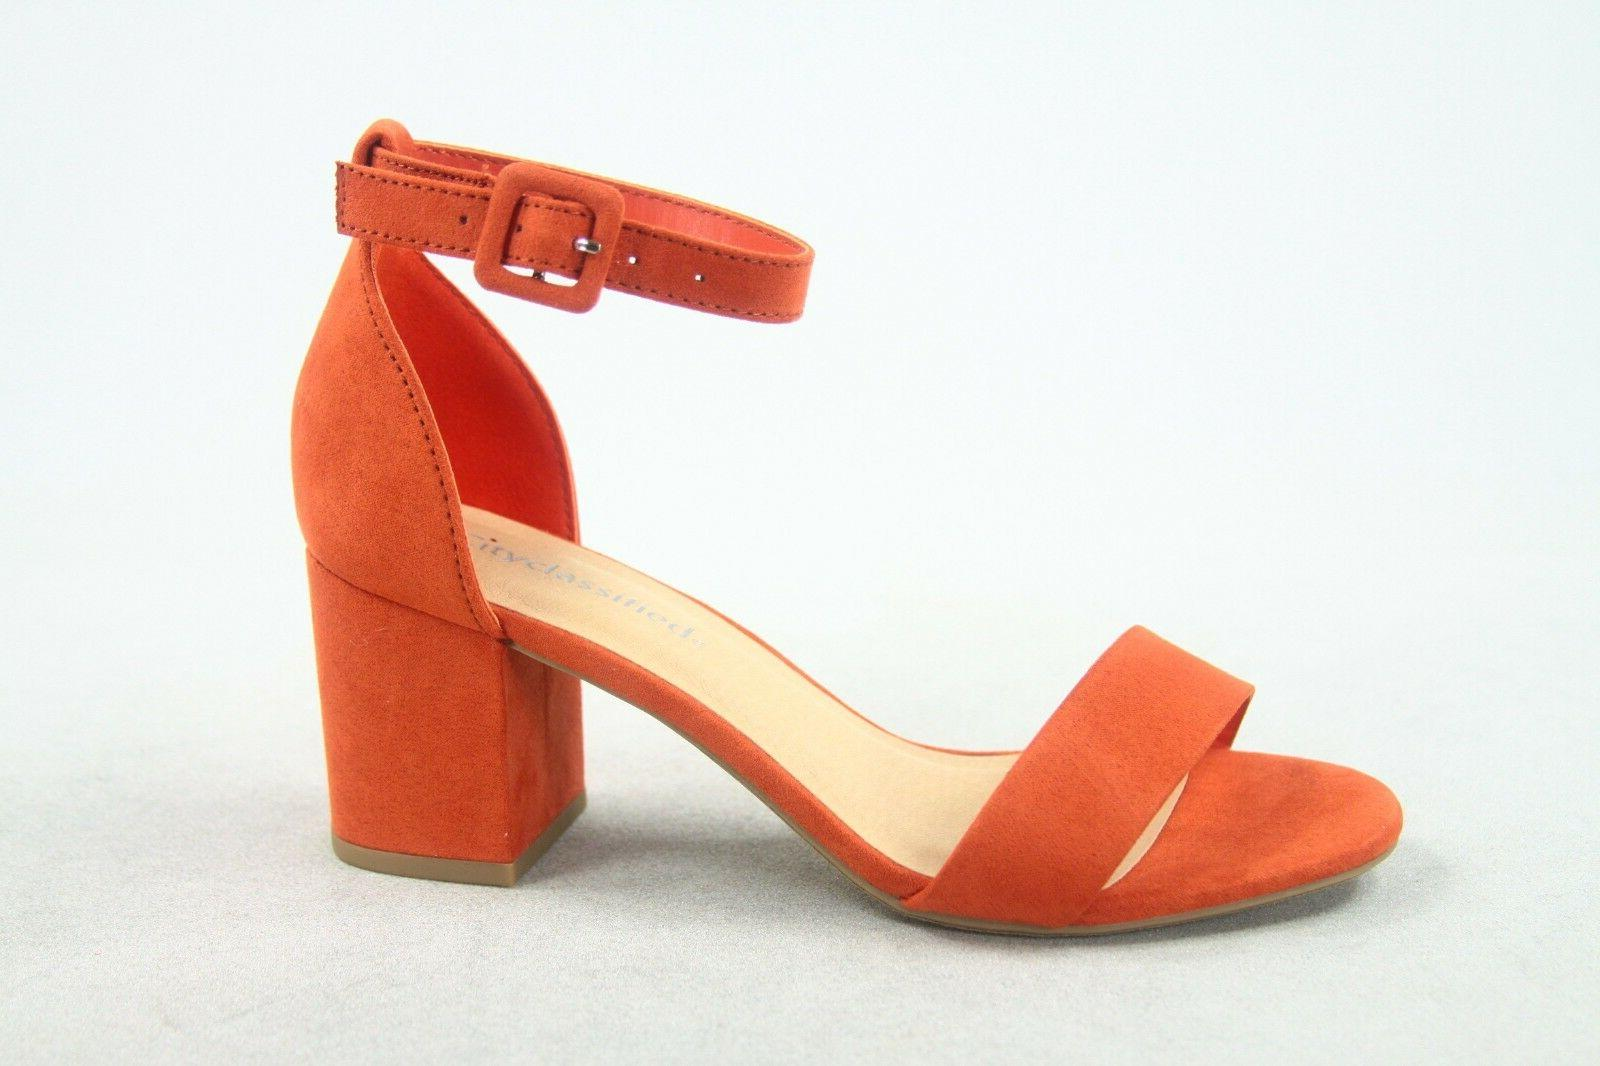 NEW Strap Chunky Dress Sandal 5 11